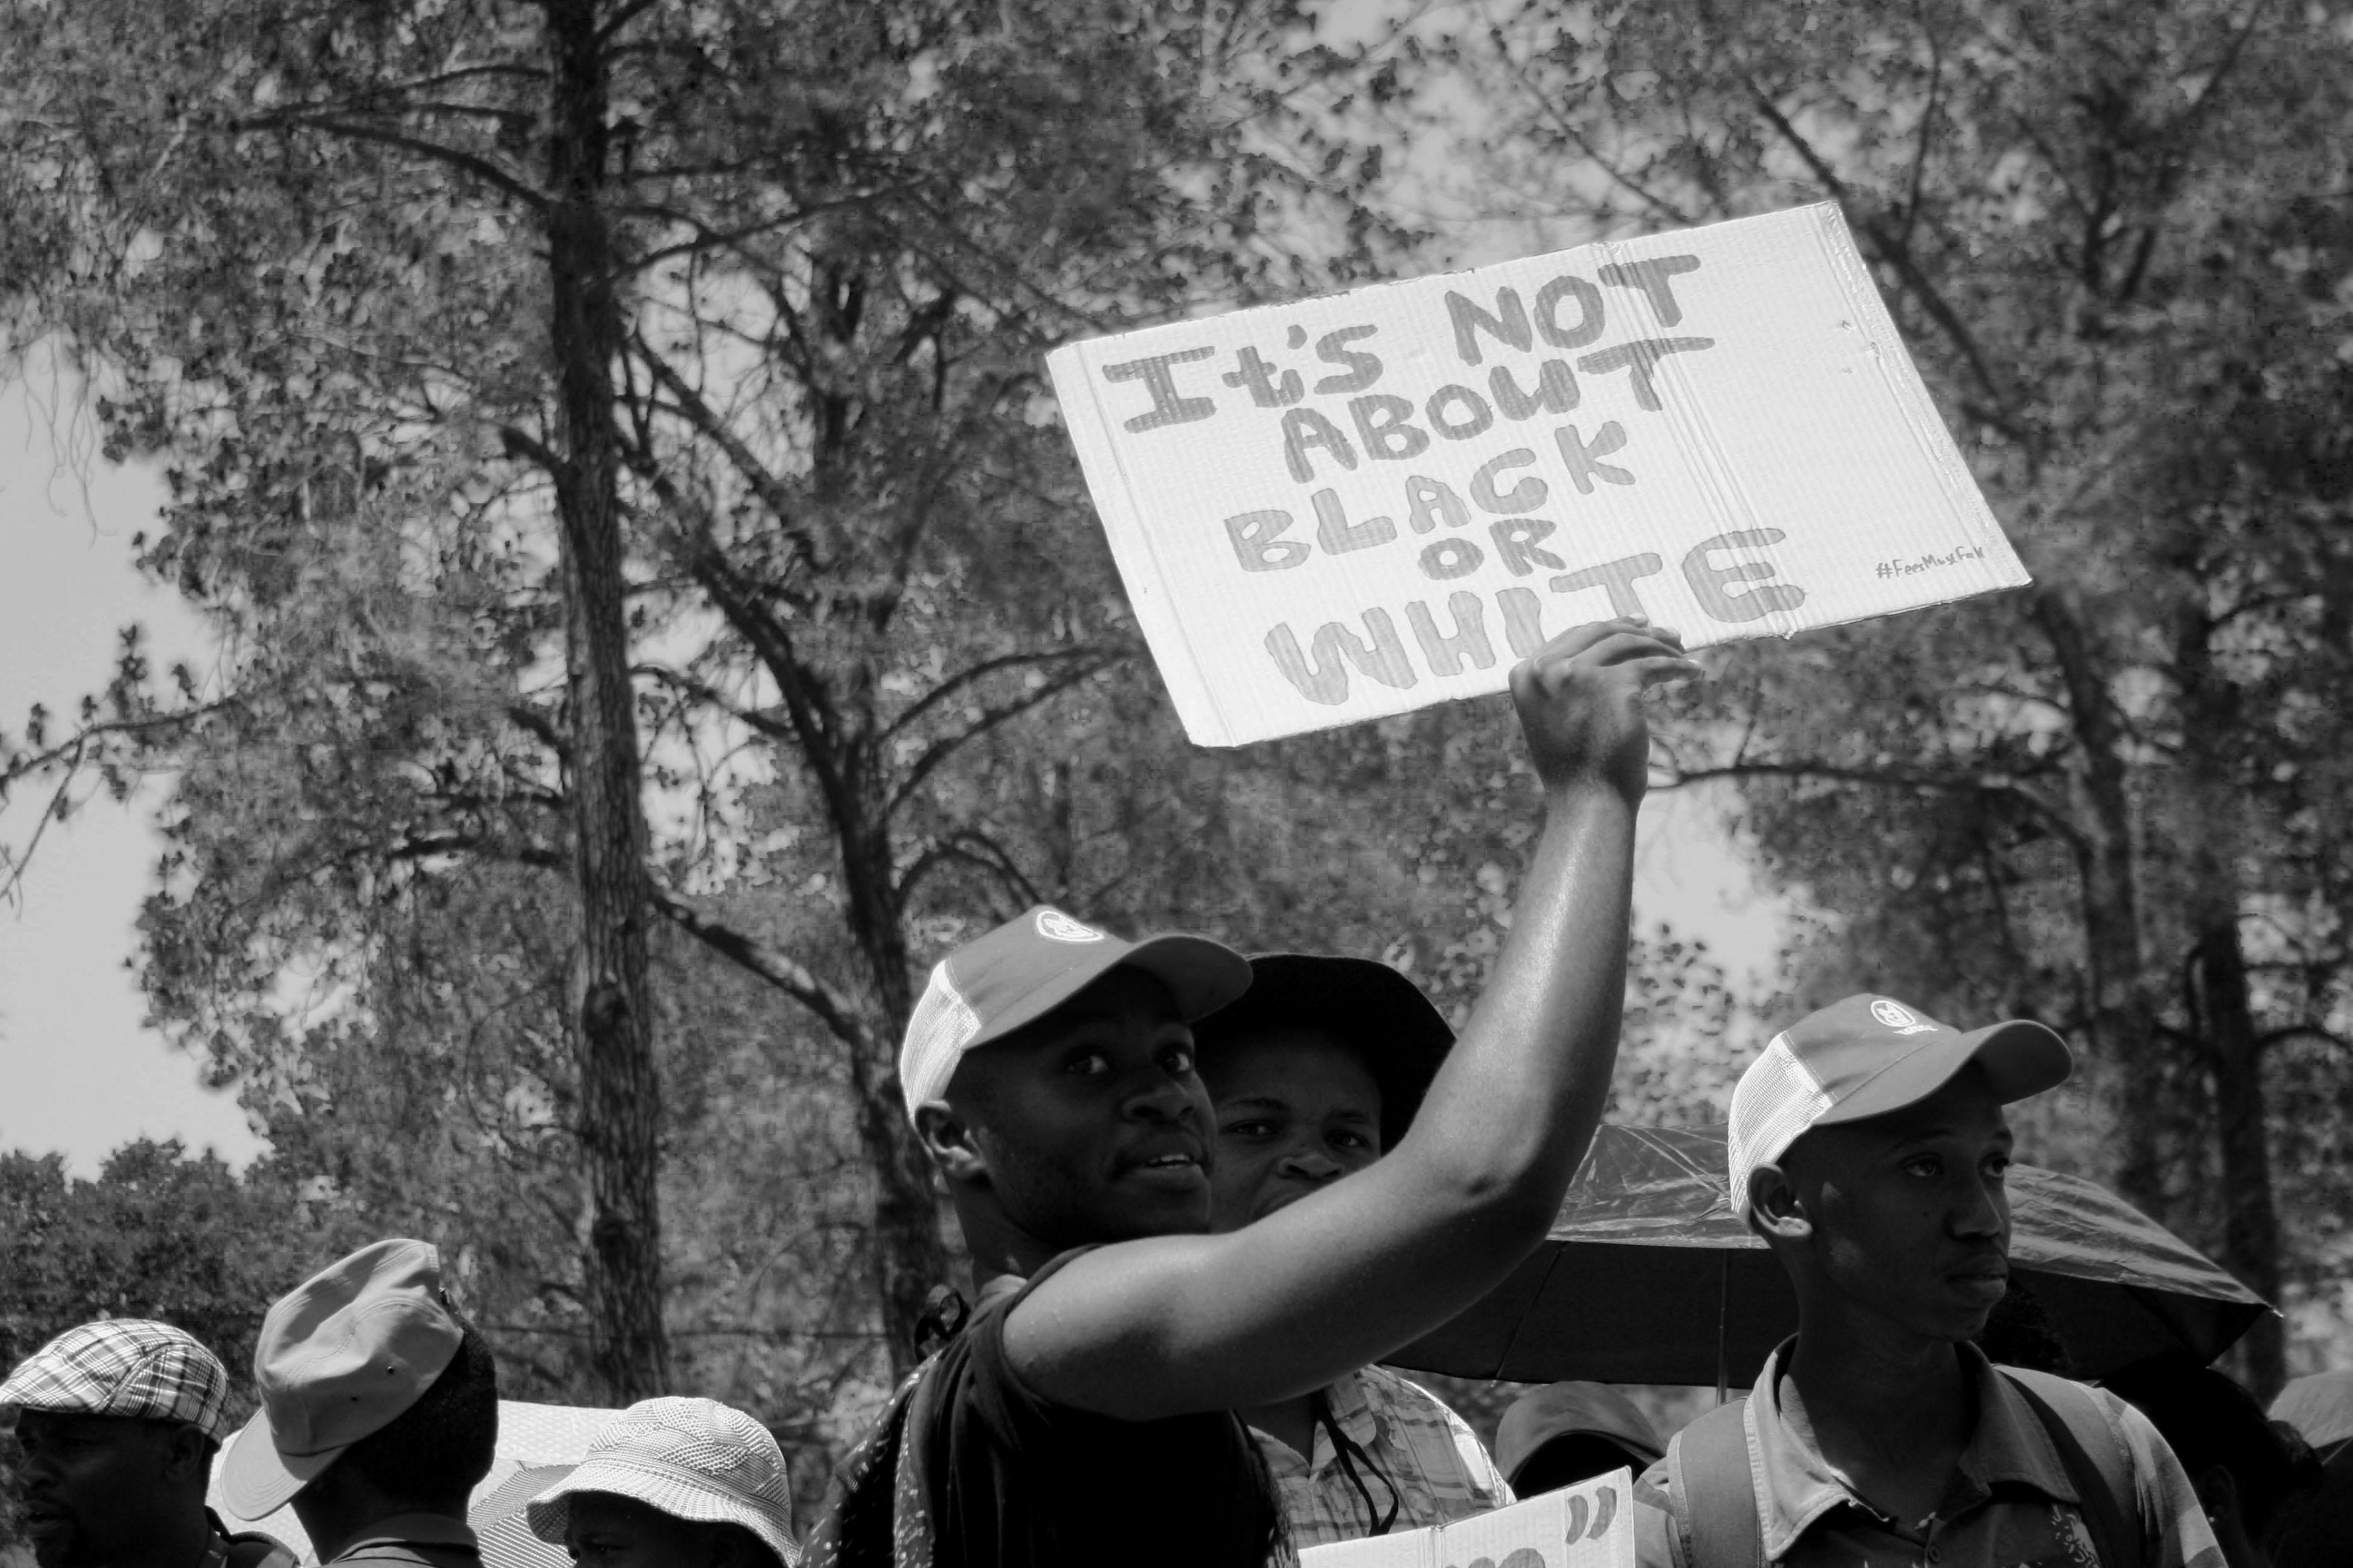 Against racism? Get involved in anti-racism week